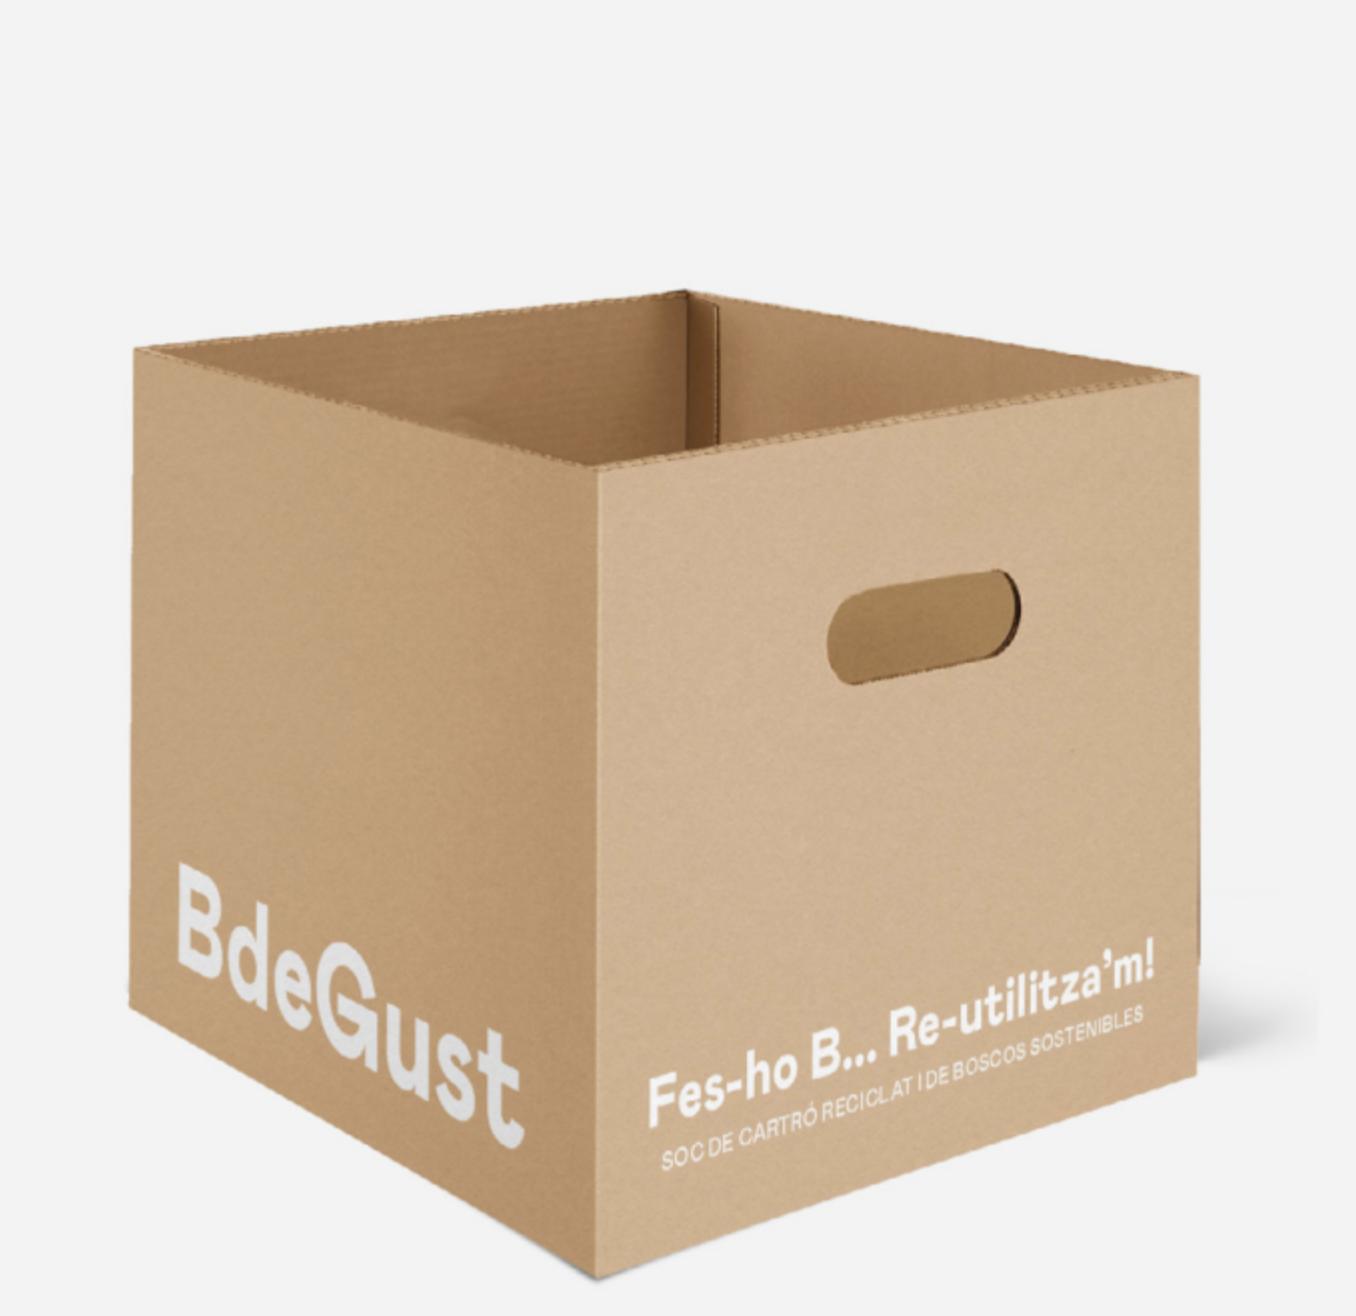 Caixa / Caja de 9 x BdeGust eco-Lager